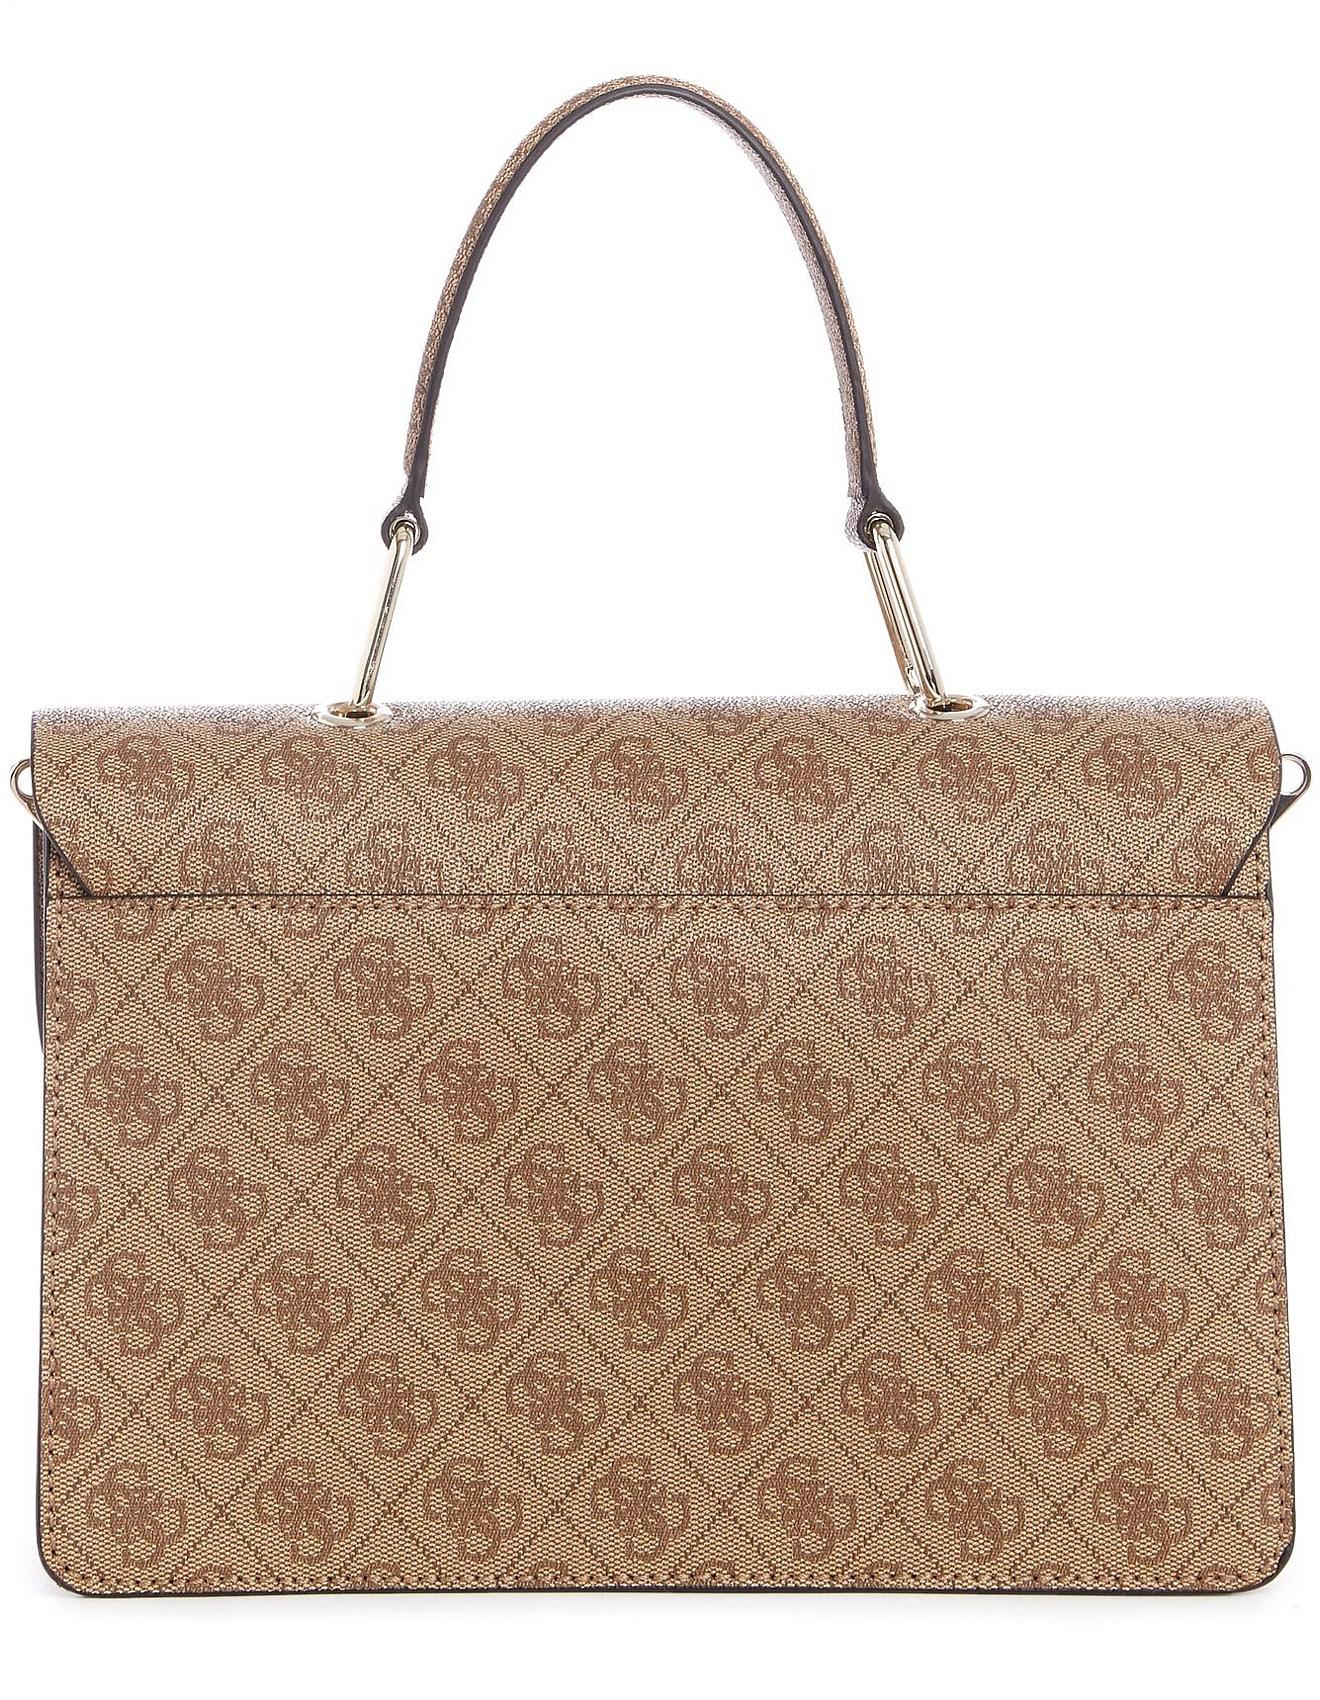 9cda41e9e4de Guess In Love Top Handle Bag - Lyst